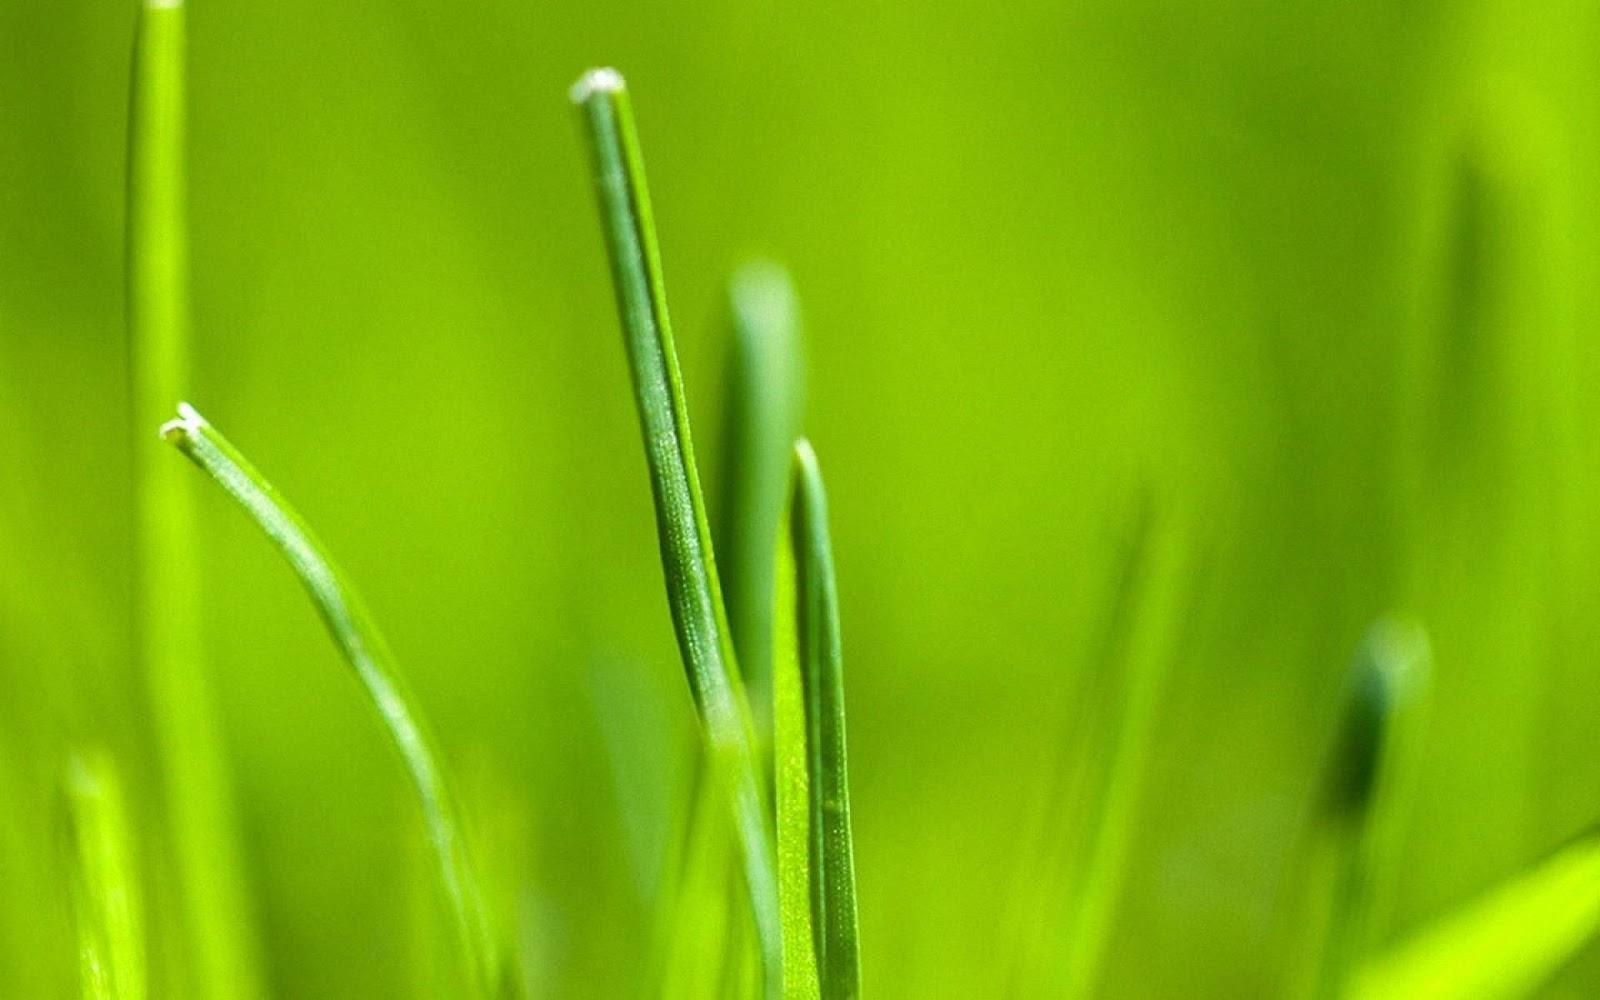 http://2.bp.blogspot.com/-n5TPKKIUYIw/Tjxh06CmDBI/AAAAAAAAIXw/iOzFnyKfrho/s1600/android-3.0-grass-wallpaper-wallpapers_HD_1920x1200.jpg